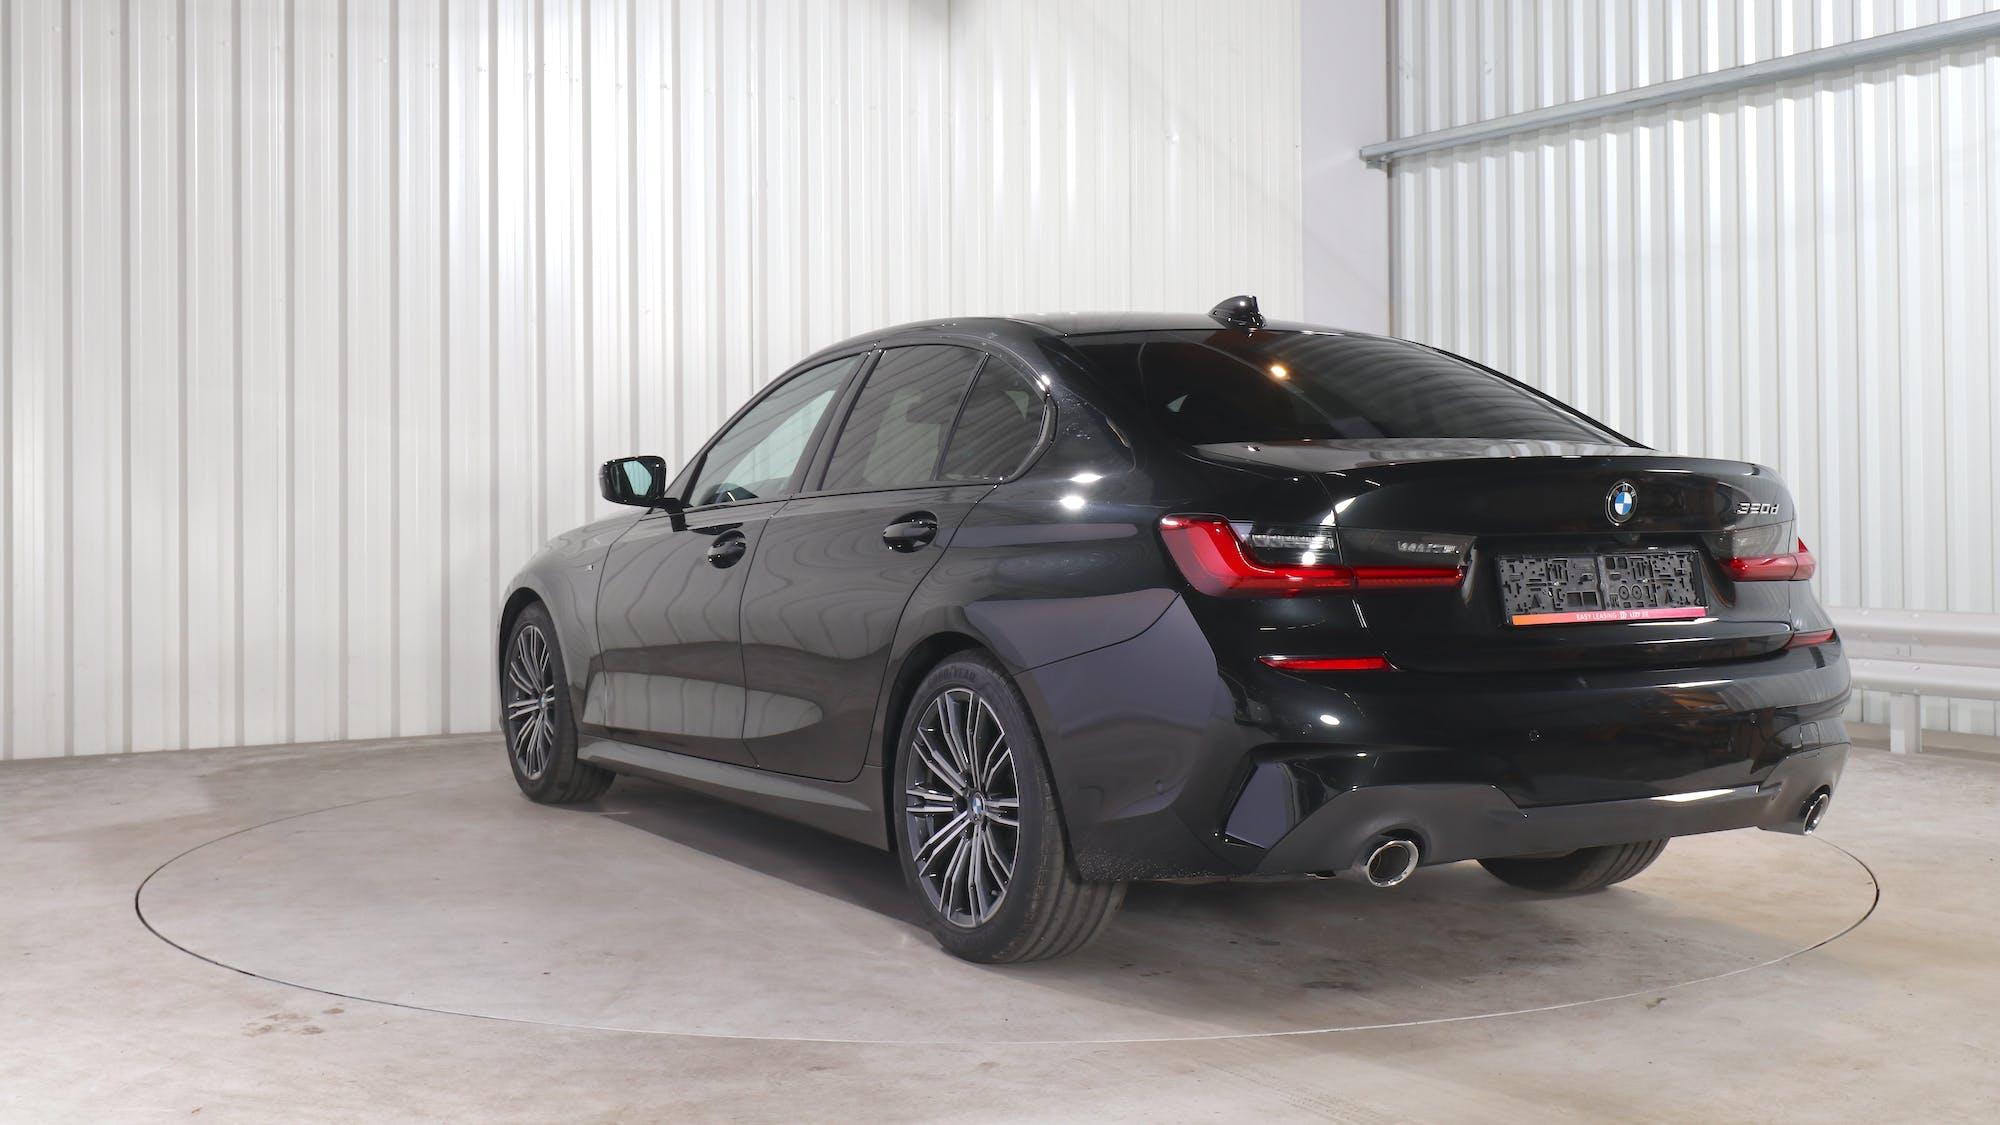 BMW 3 (G20) leasing exterior 4